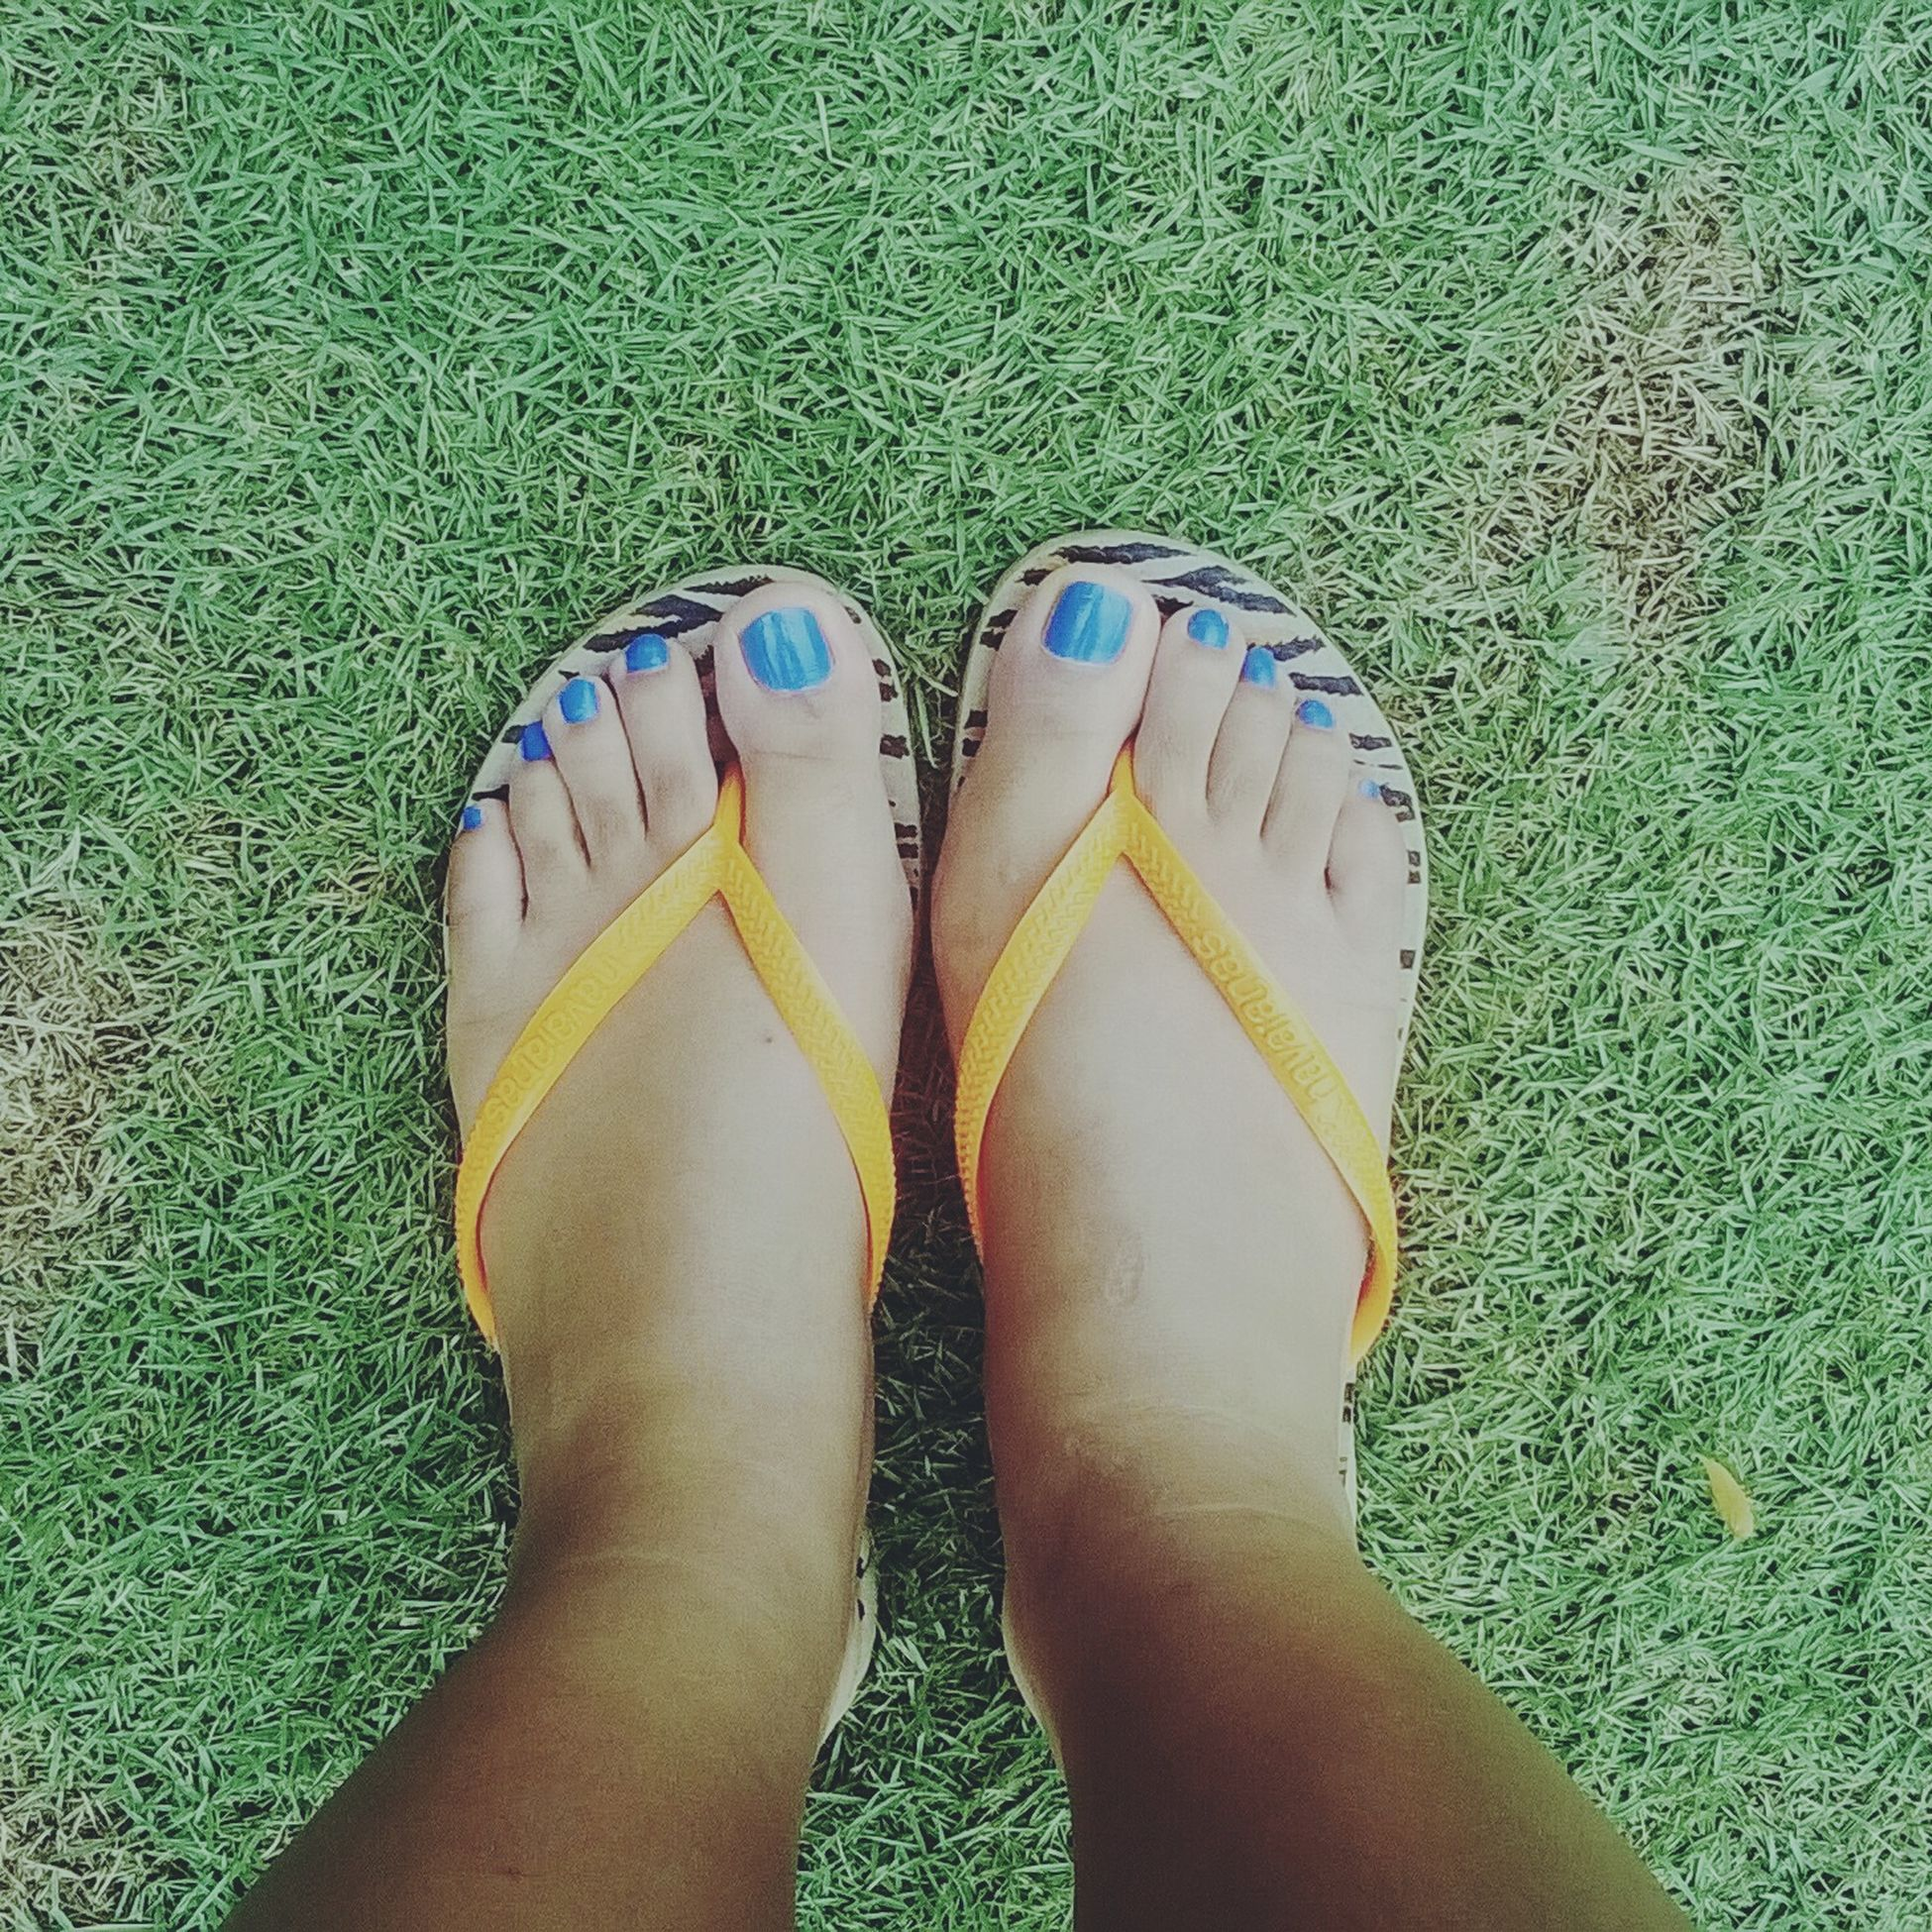 Feet Girlfriend Art Swimming Pool